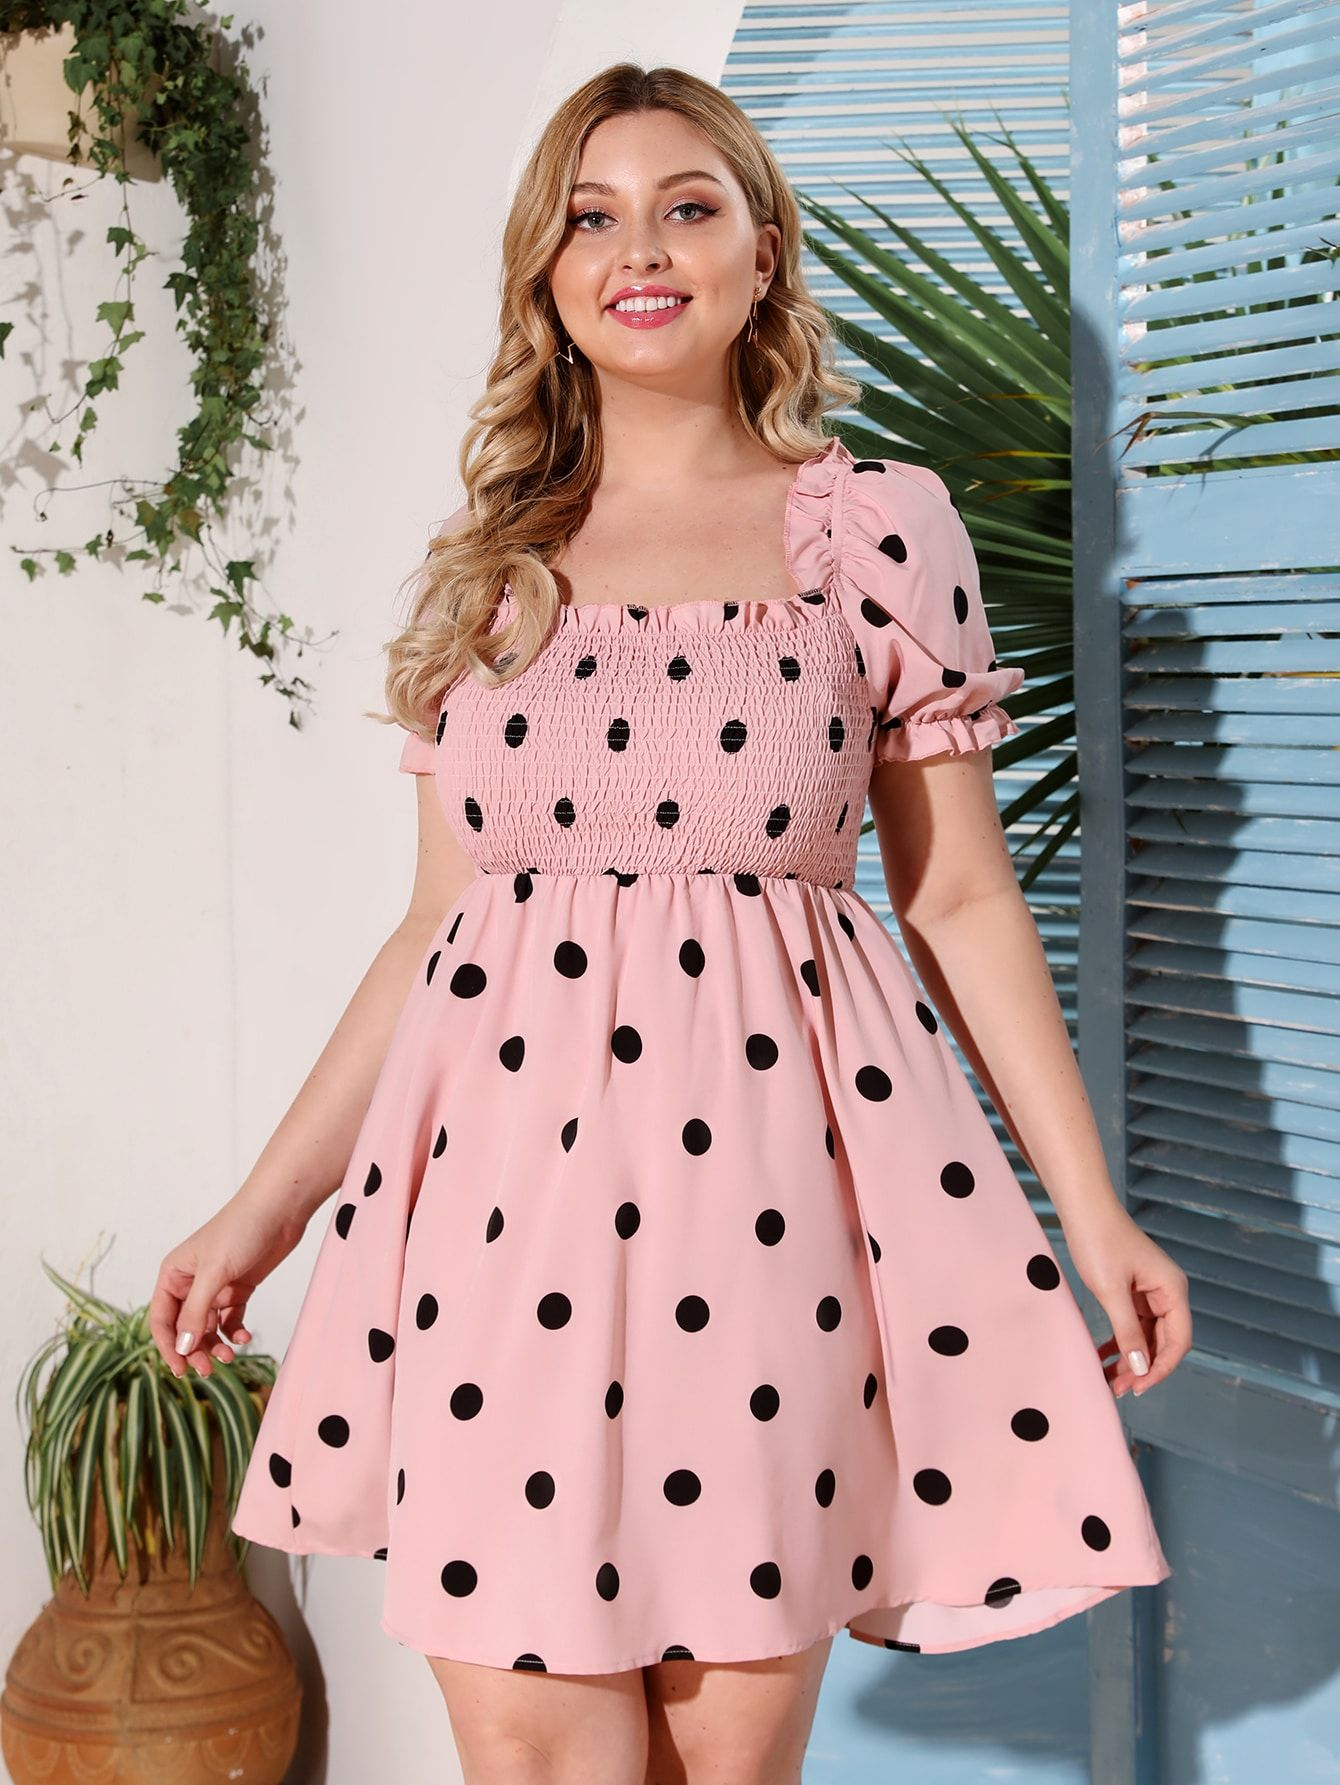 Plus Polka Dot Shirred Chiffon Milkmaid Dress Shein Usa Short Summer Dresses Summer Dresses Curvy Spotted Dress [ 1785 x 1340 Pixel ]